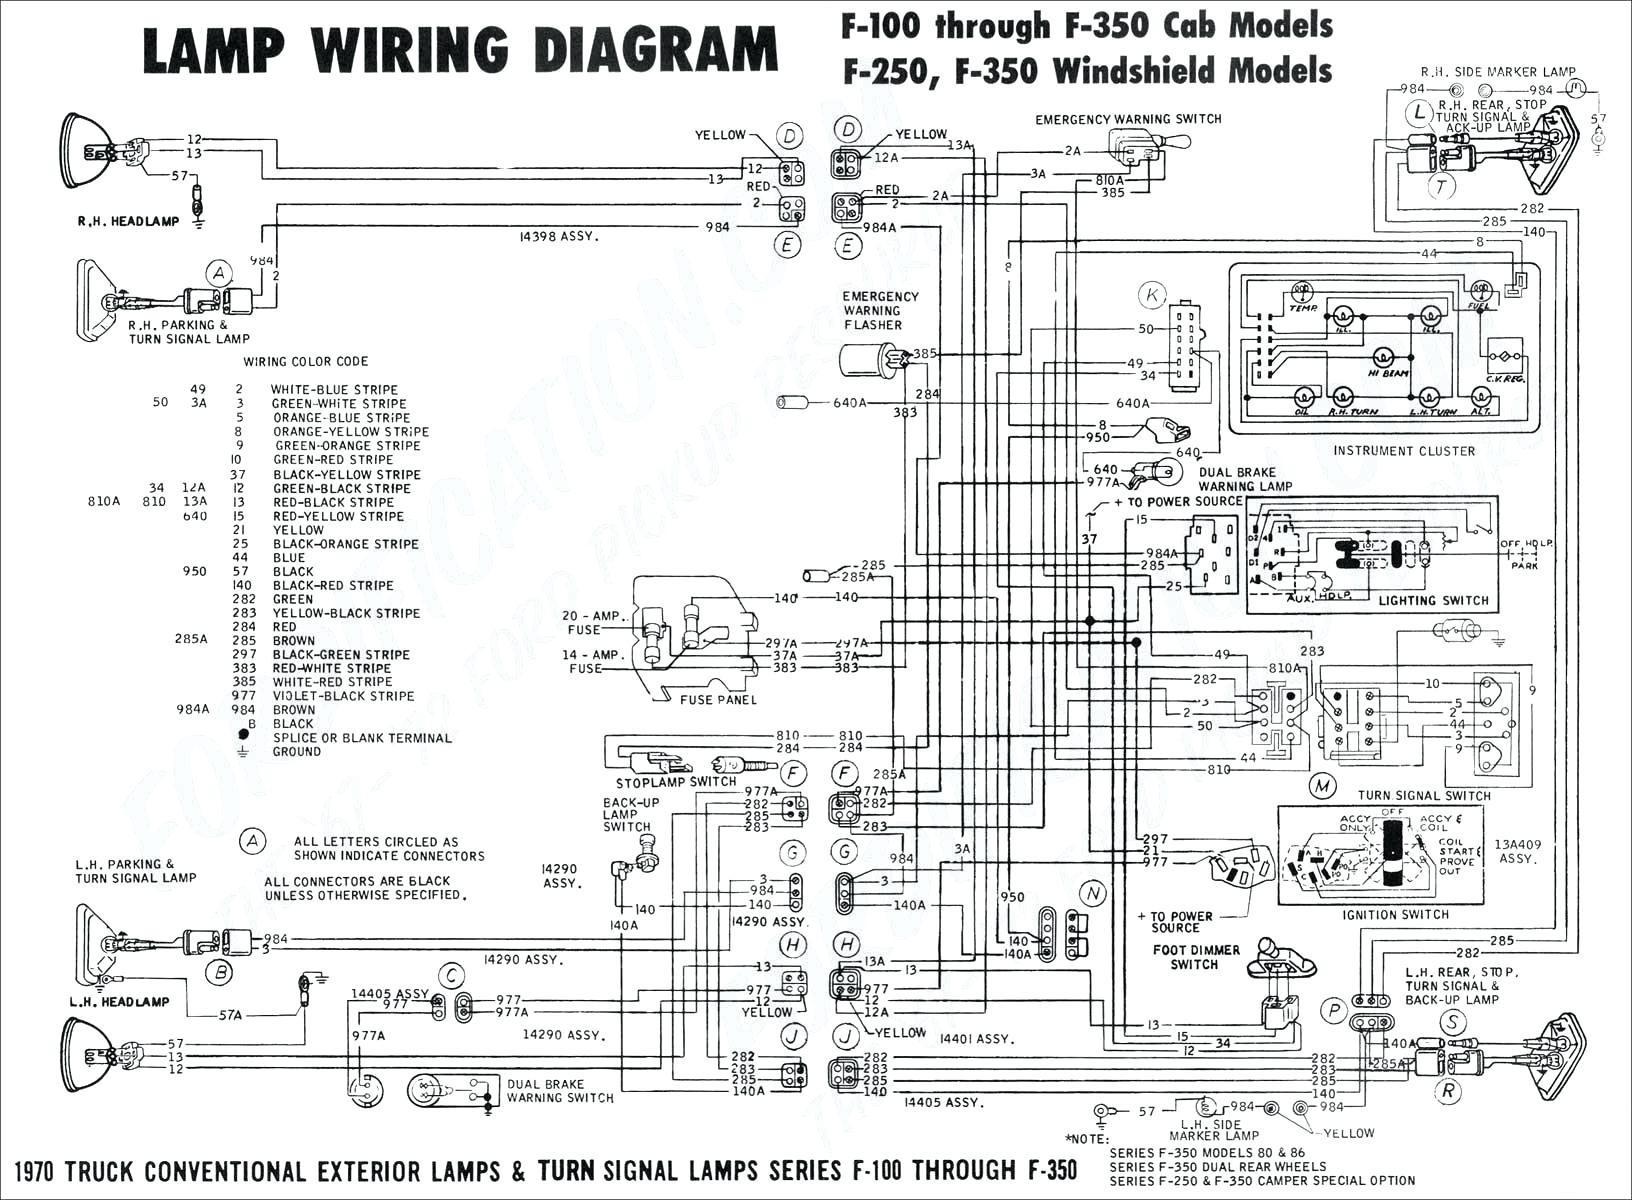 65 chevy truck turn signal wiring diagram